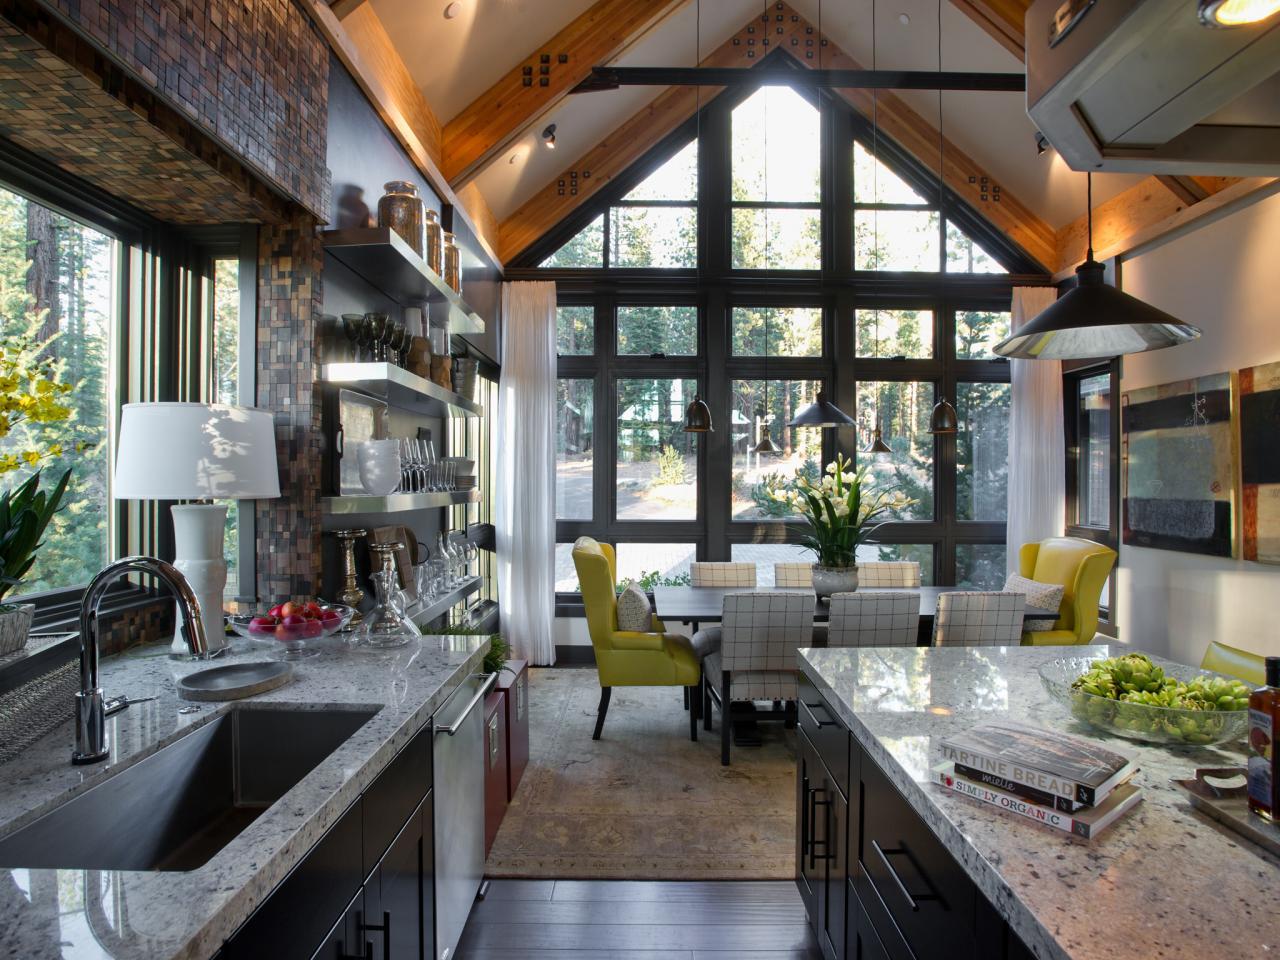 Modern Rustic Google Search Hgtv Dream Homes Hgtv Dream Home